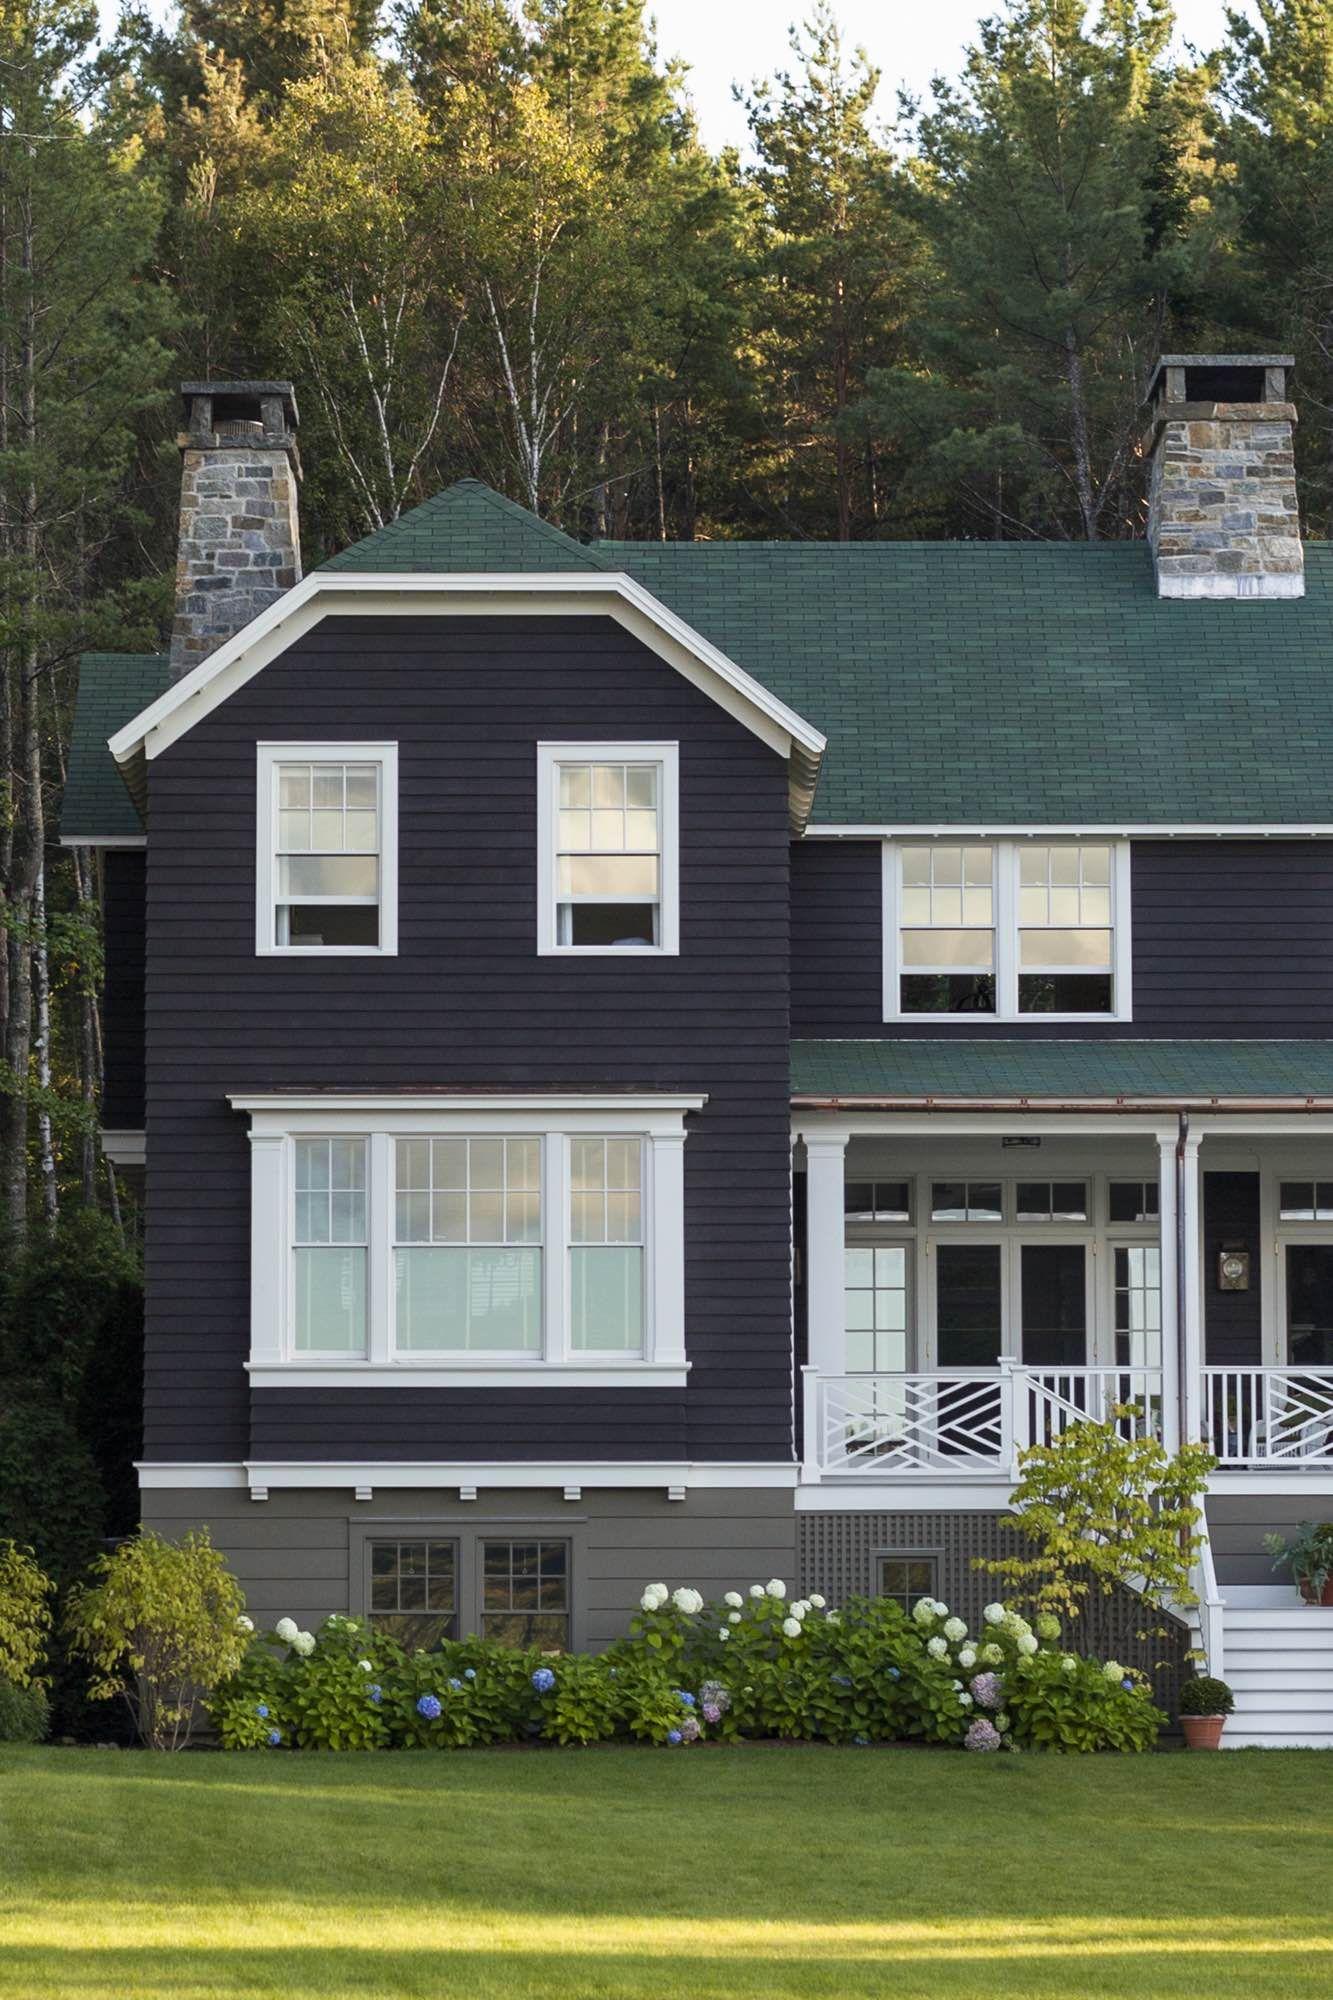 Best Waterfront House In The Adirondacks G P Schafer 400 x 300